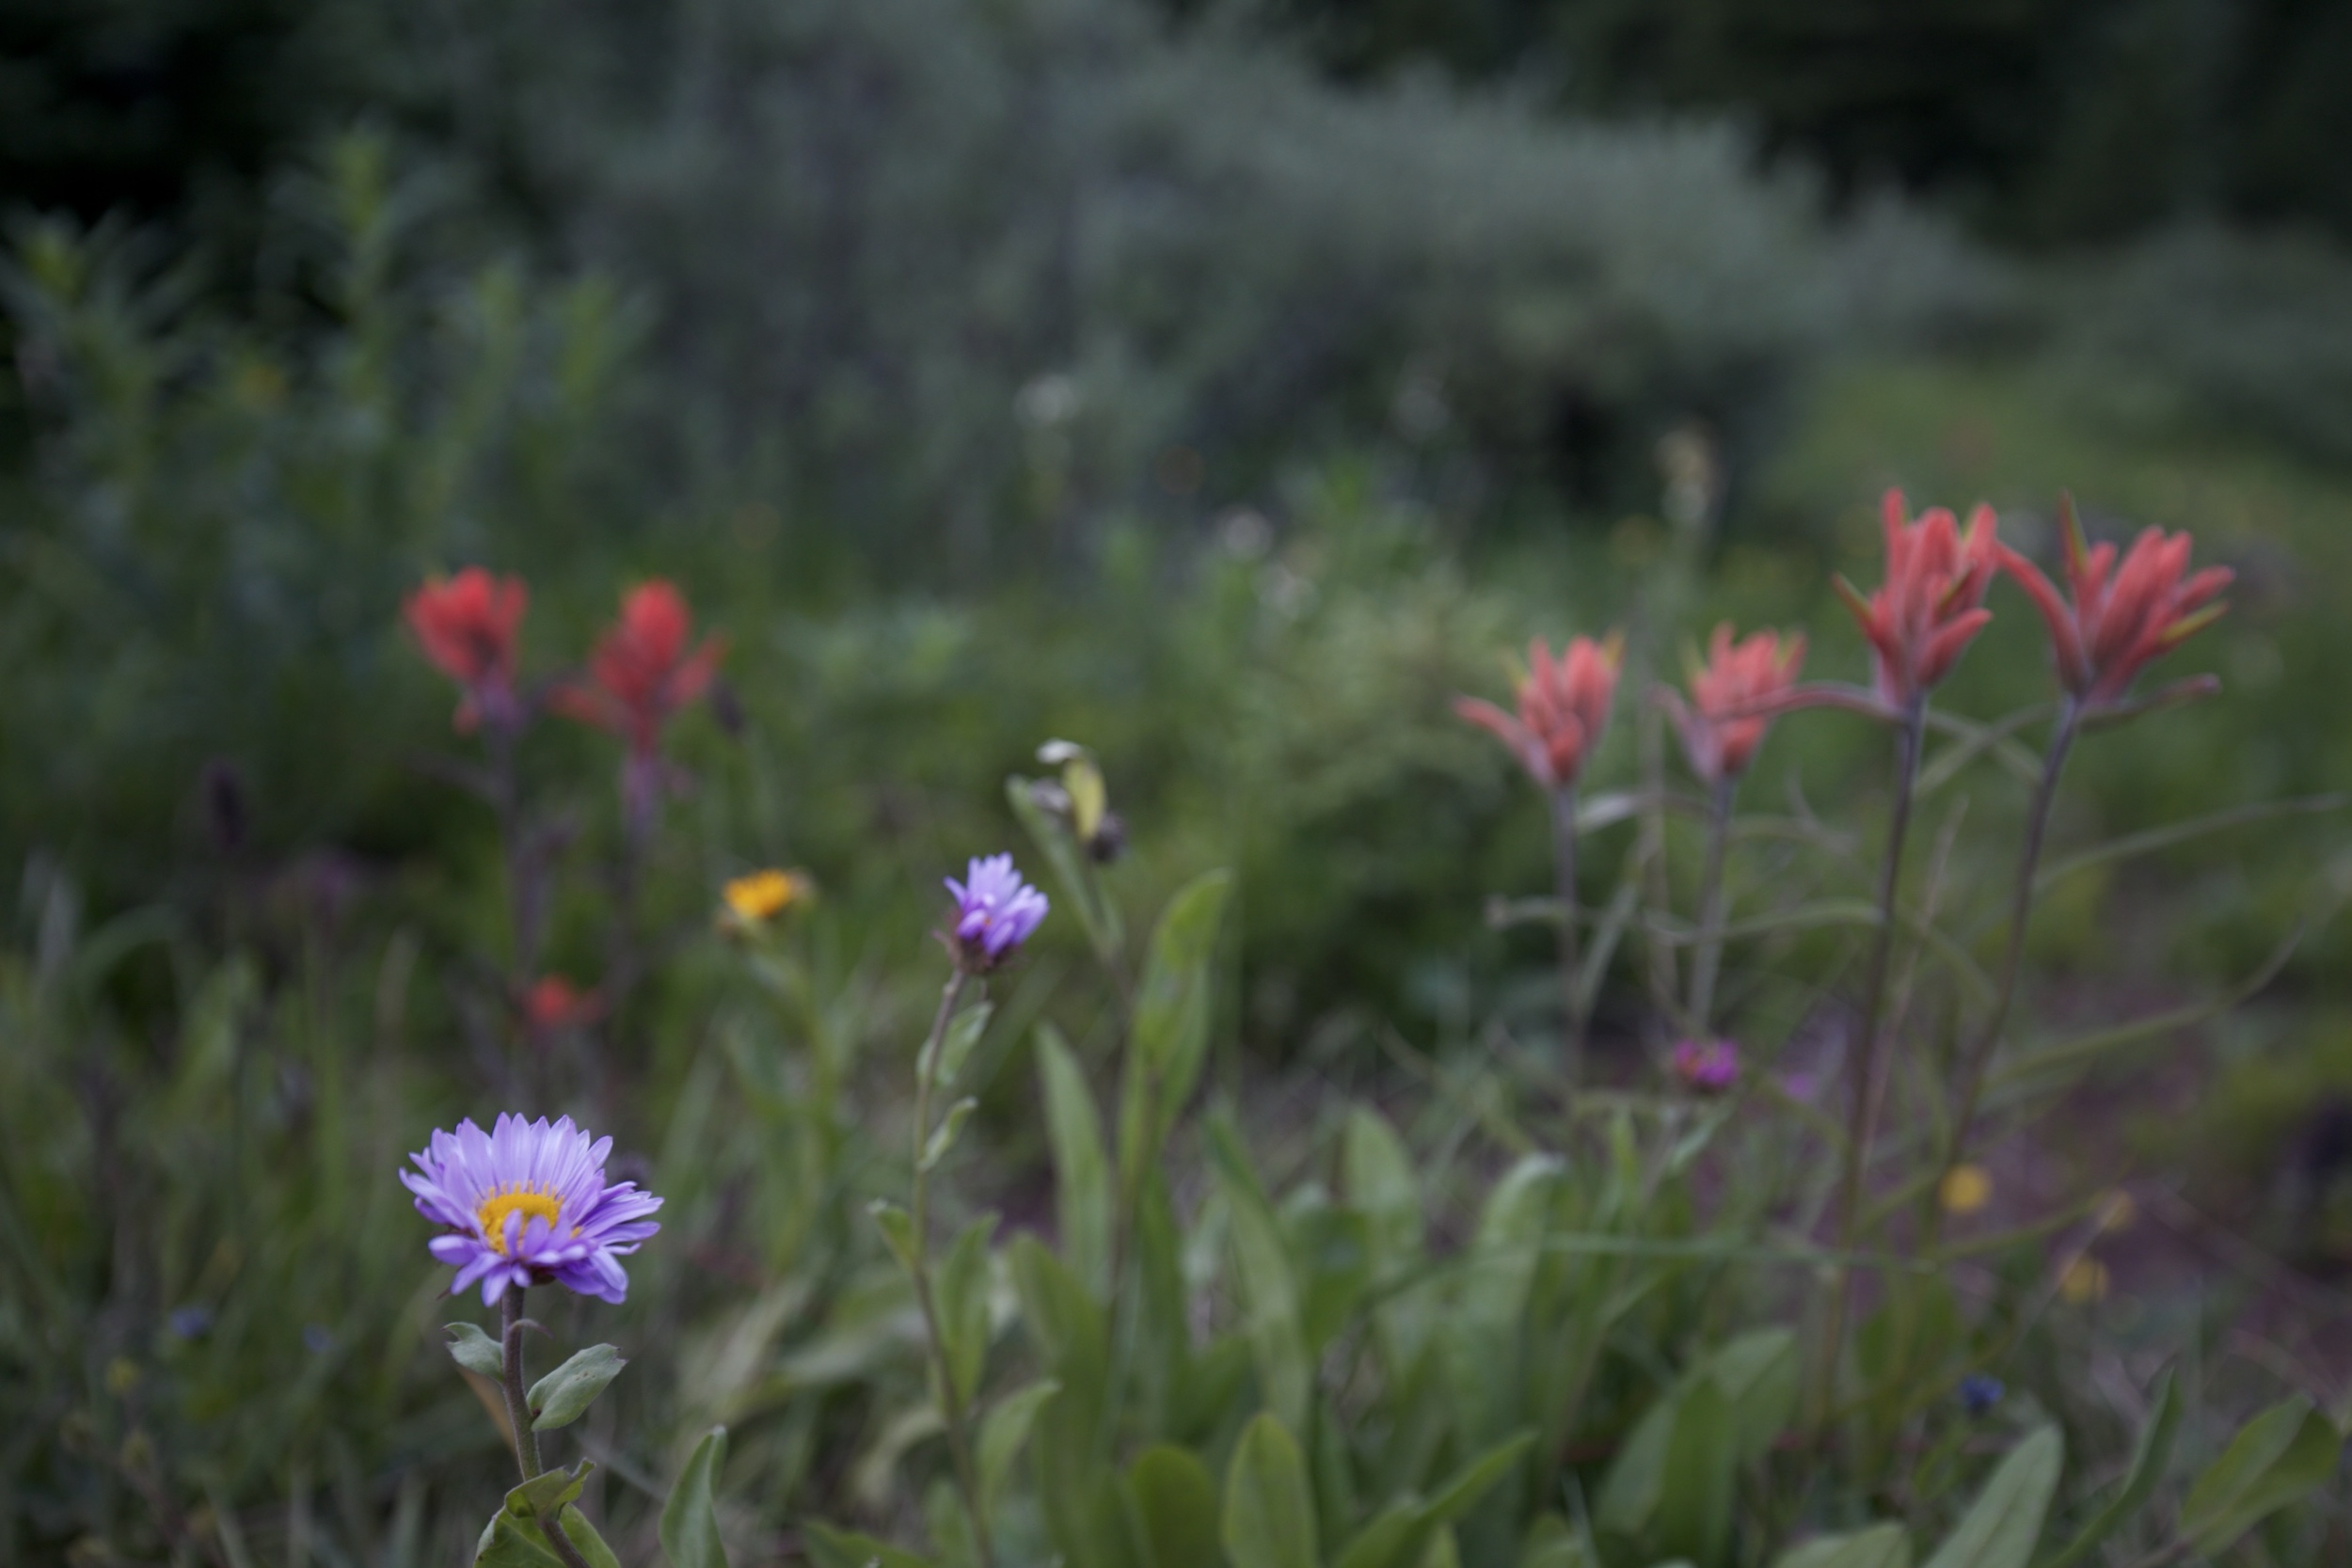 Alpine Aster purple daisies and red Desert Paintbrush flowers.